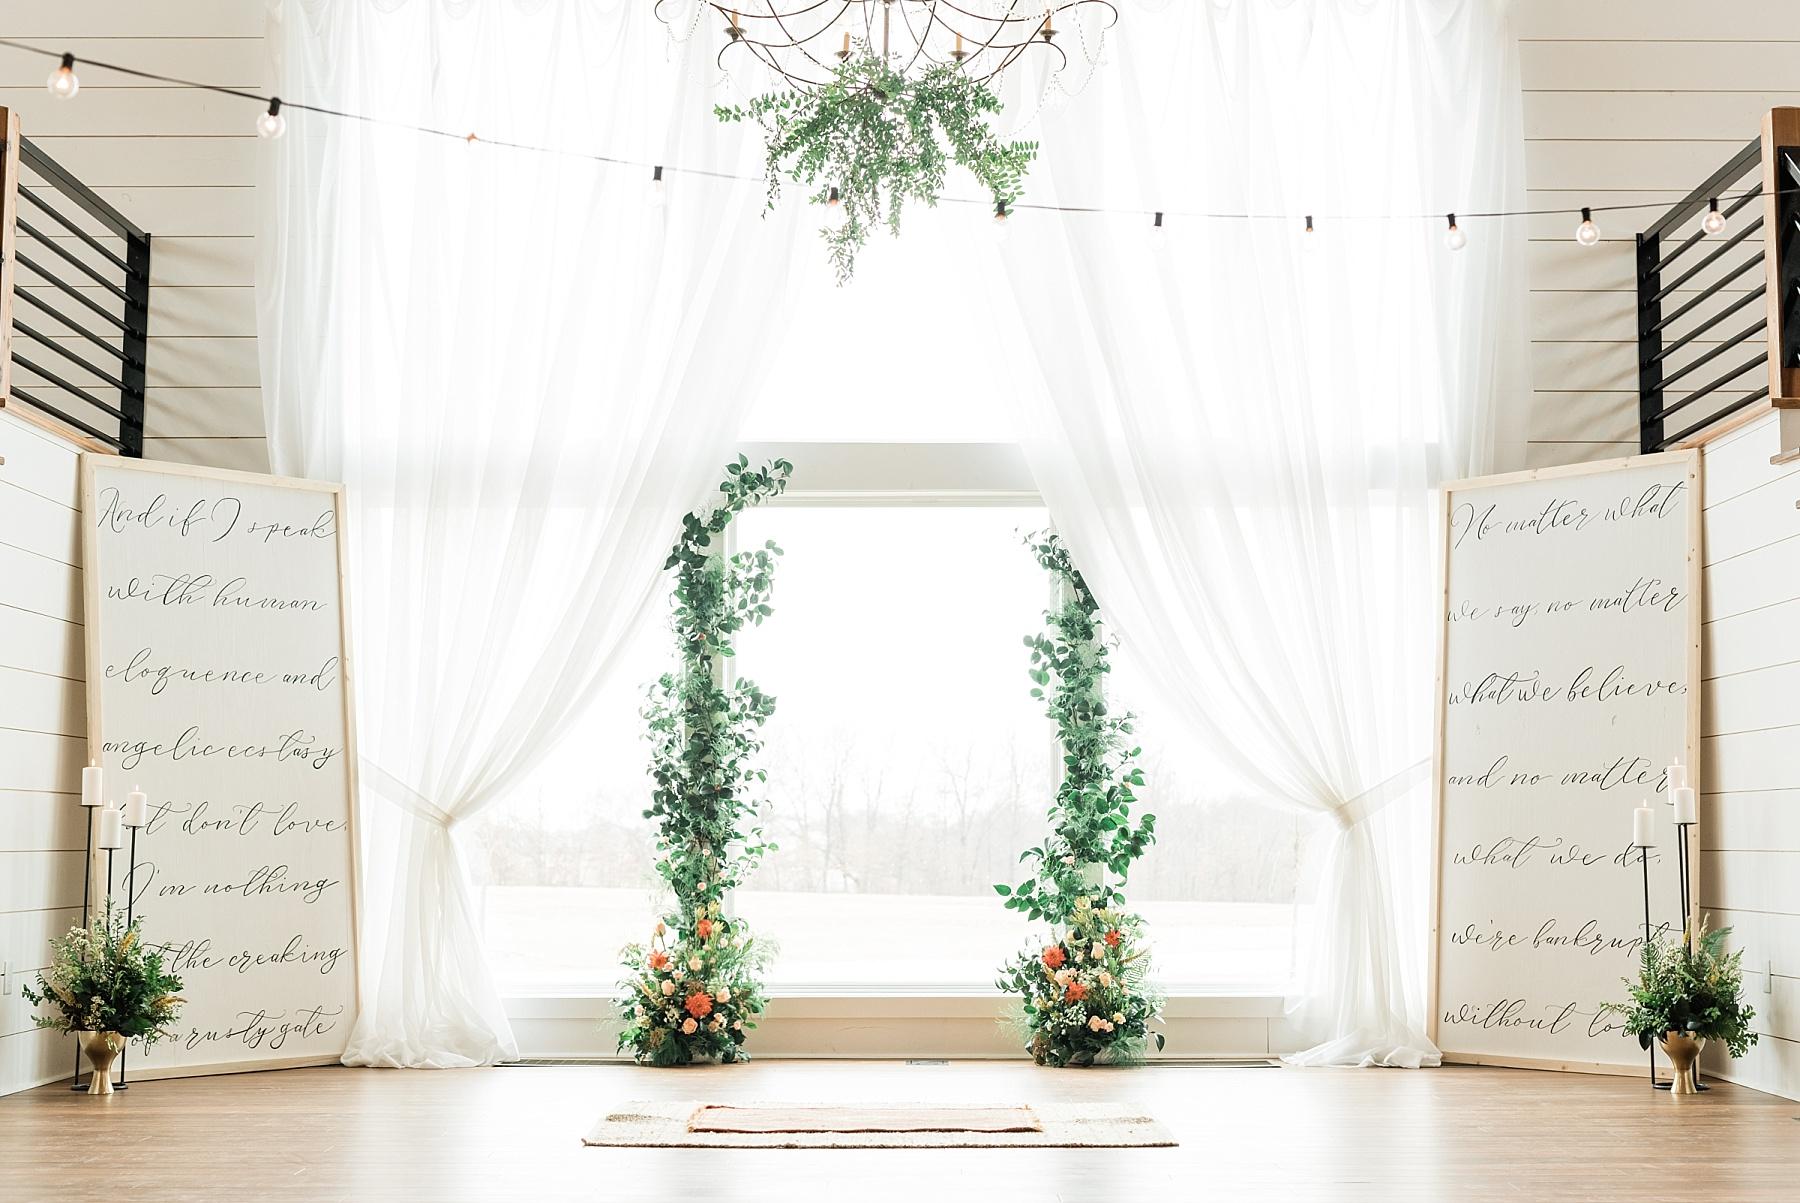 Eclectic Scandinavian Winter Wedding in All White Venue Emerson Fields by Kelsi Kliethermes Photography Best Missouri and Maui Wedding Photographer_0029.jpg